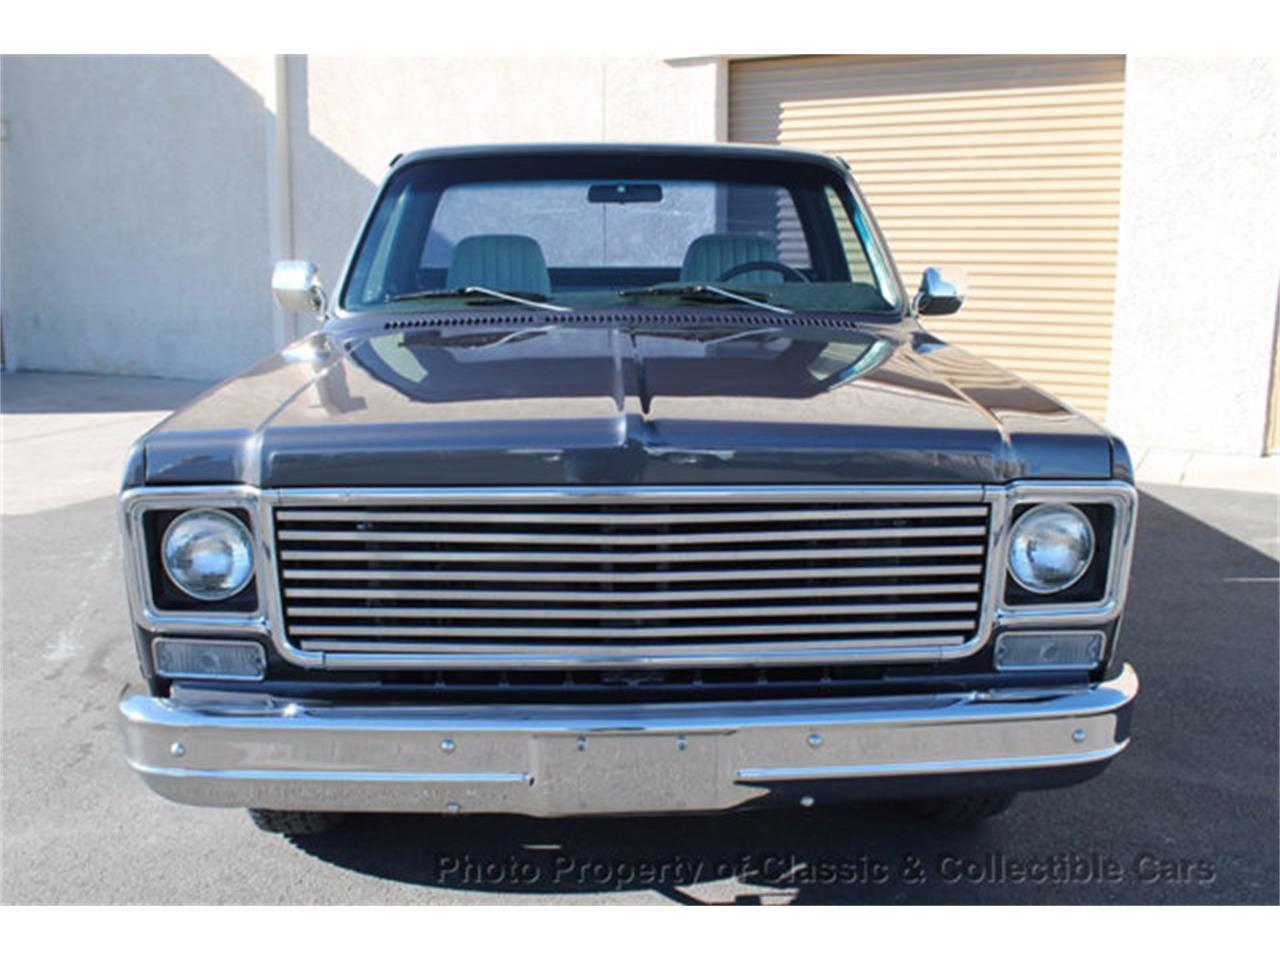 1976 Gmc Sierra Grande For Sale Classiccars Com Cc 947513